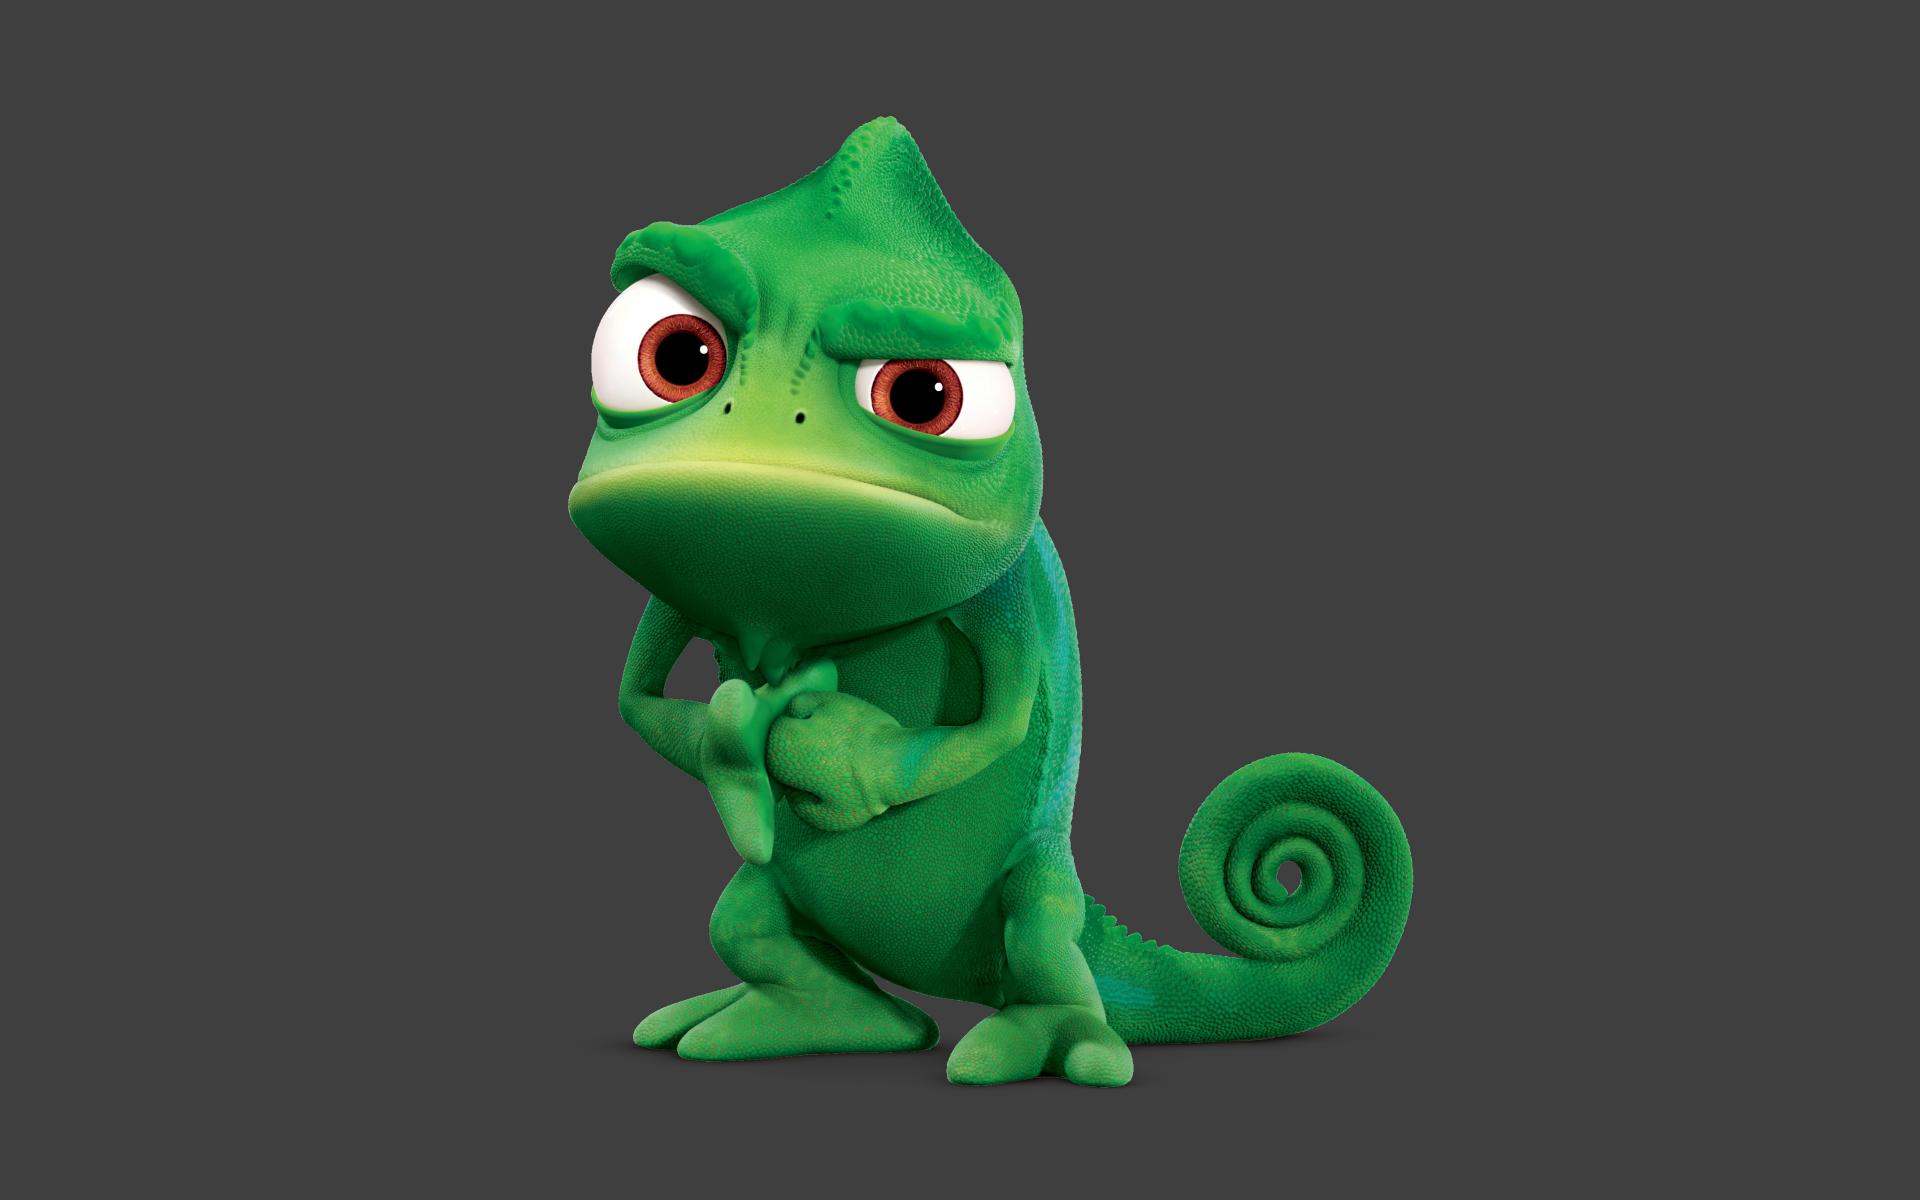 raiponce et pascal - Recherche Google | Disney pixar | Pinterest